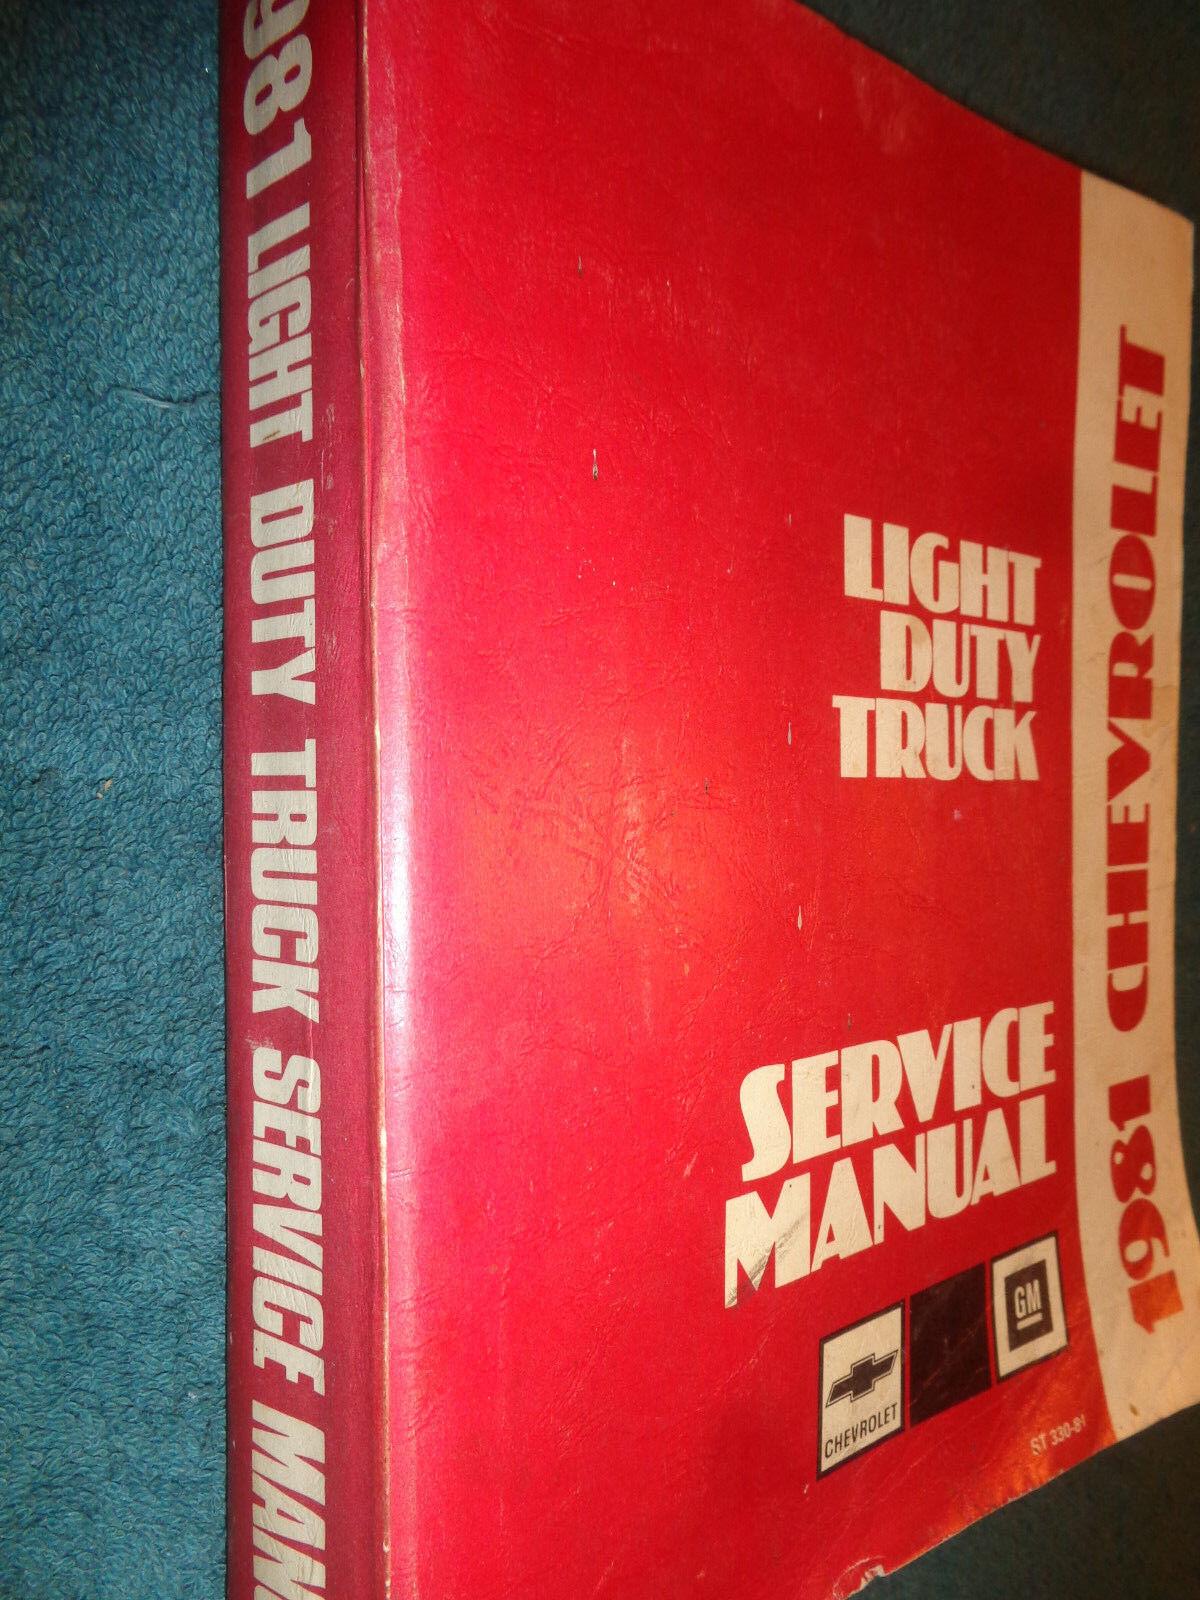 1981 CHEVROLET TRUCK SHOP MANUAL / ORIG. BOOK PICKUP SUBURBAN BLAZER VAN 2WD 4WD